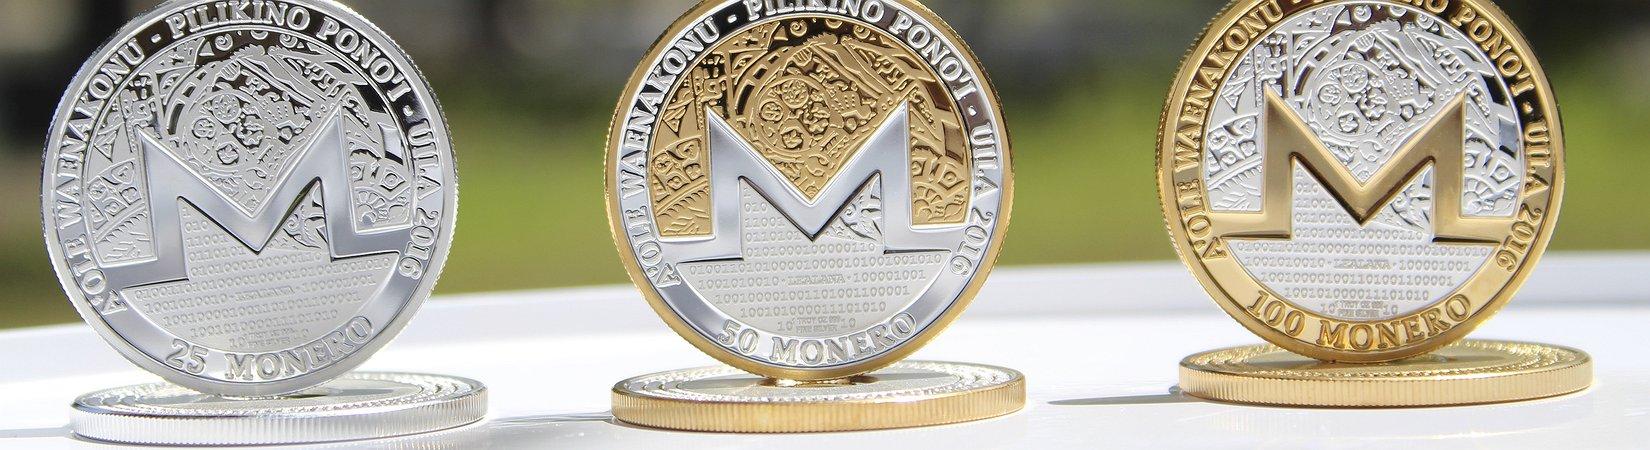 Bitcoinkonkurrent Monero hat gute Aussichten